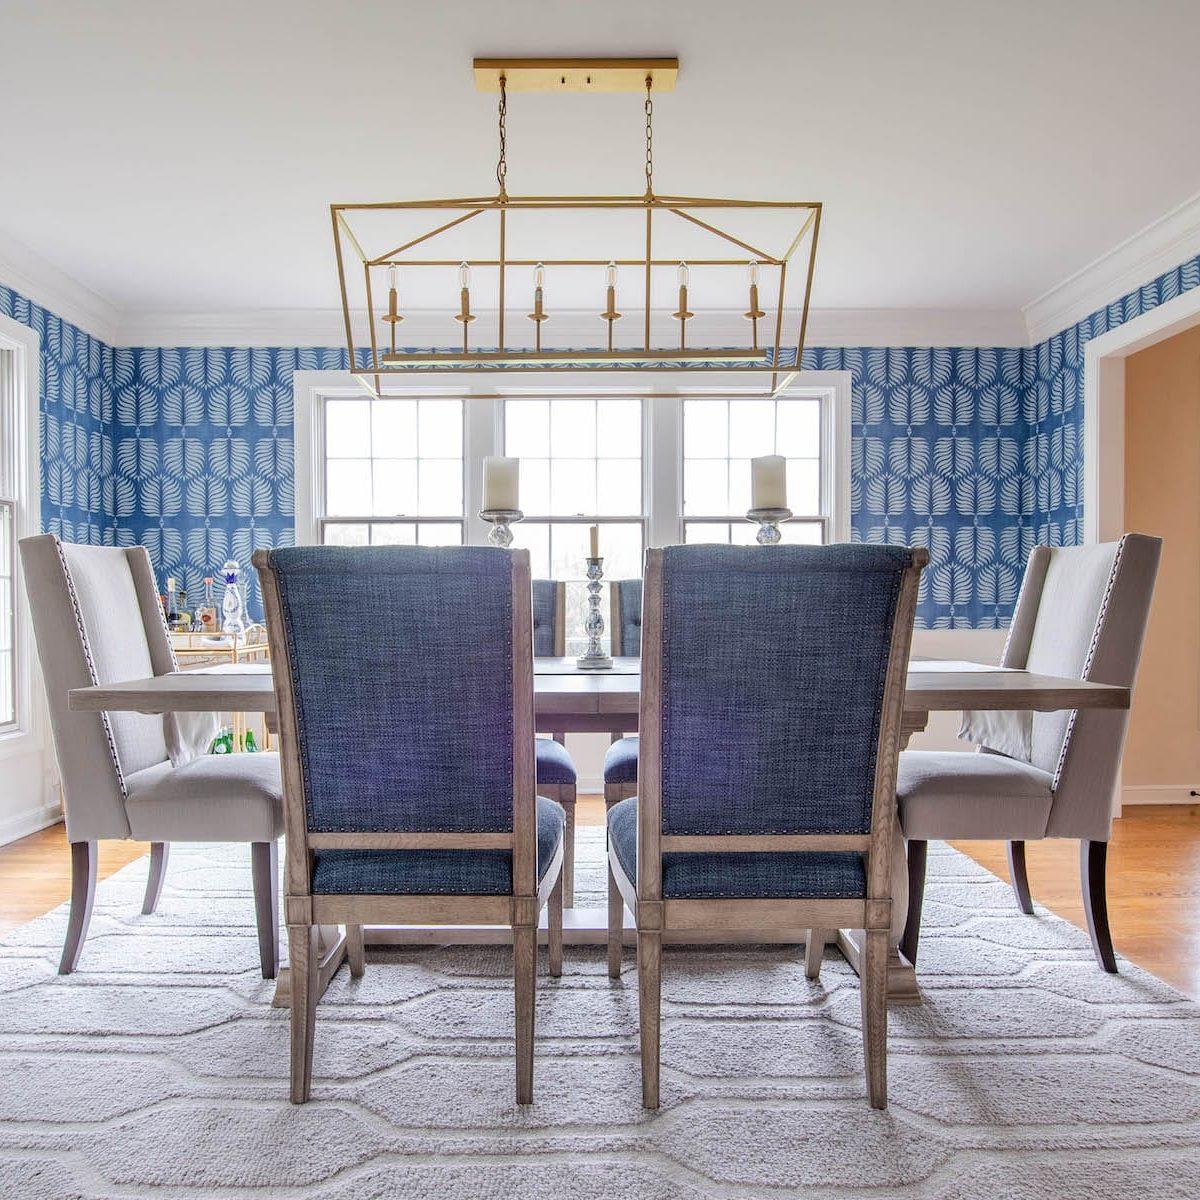 Chagrin Falls, Ohio Interior Design, Dining 4, Ingrid Porter Interiors, The Indigo Project